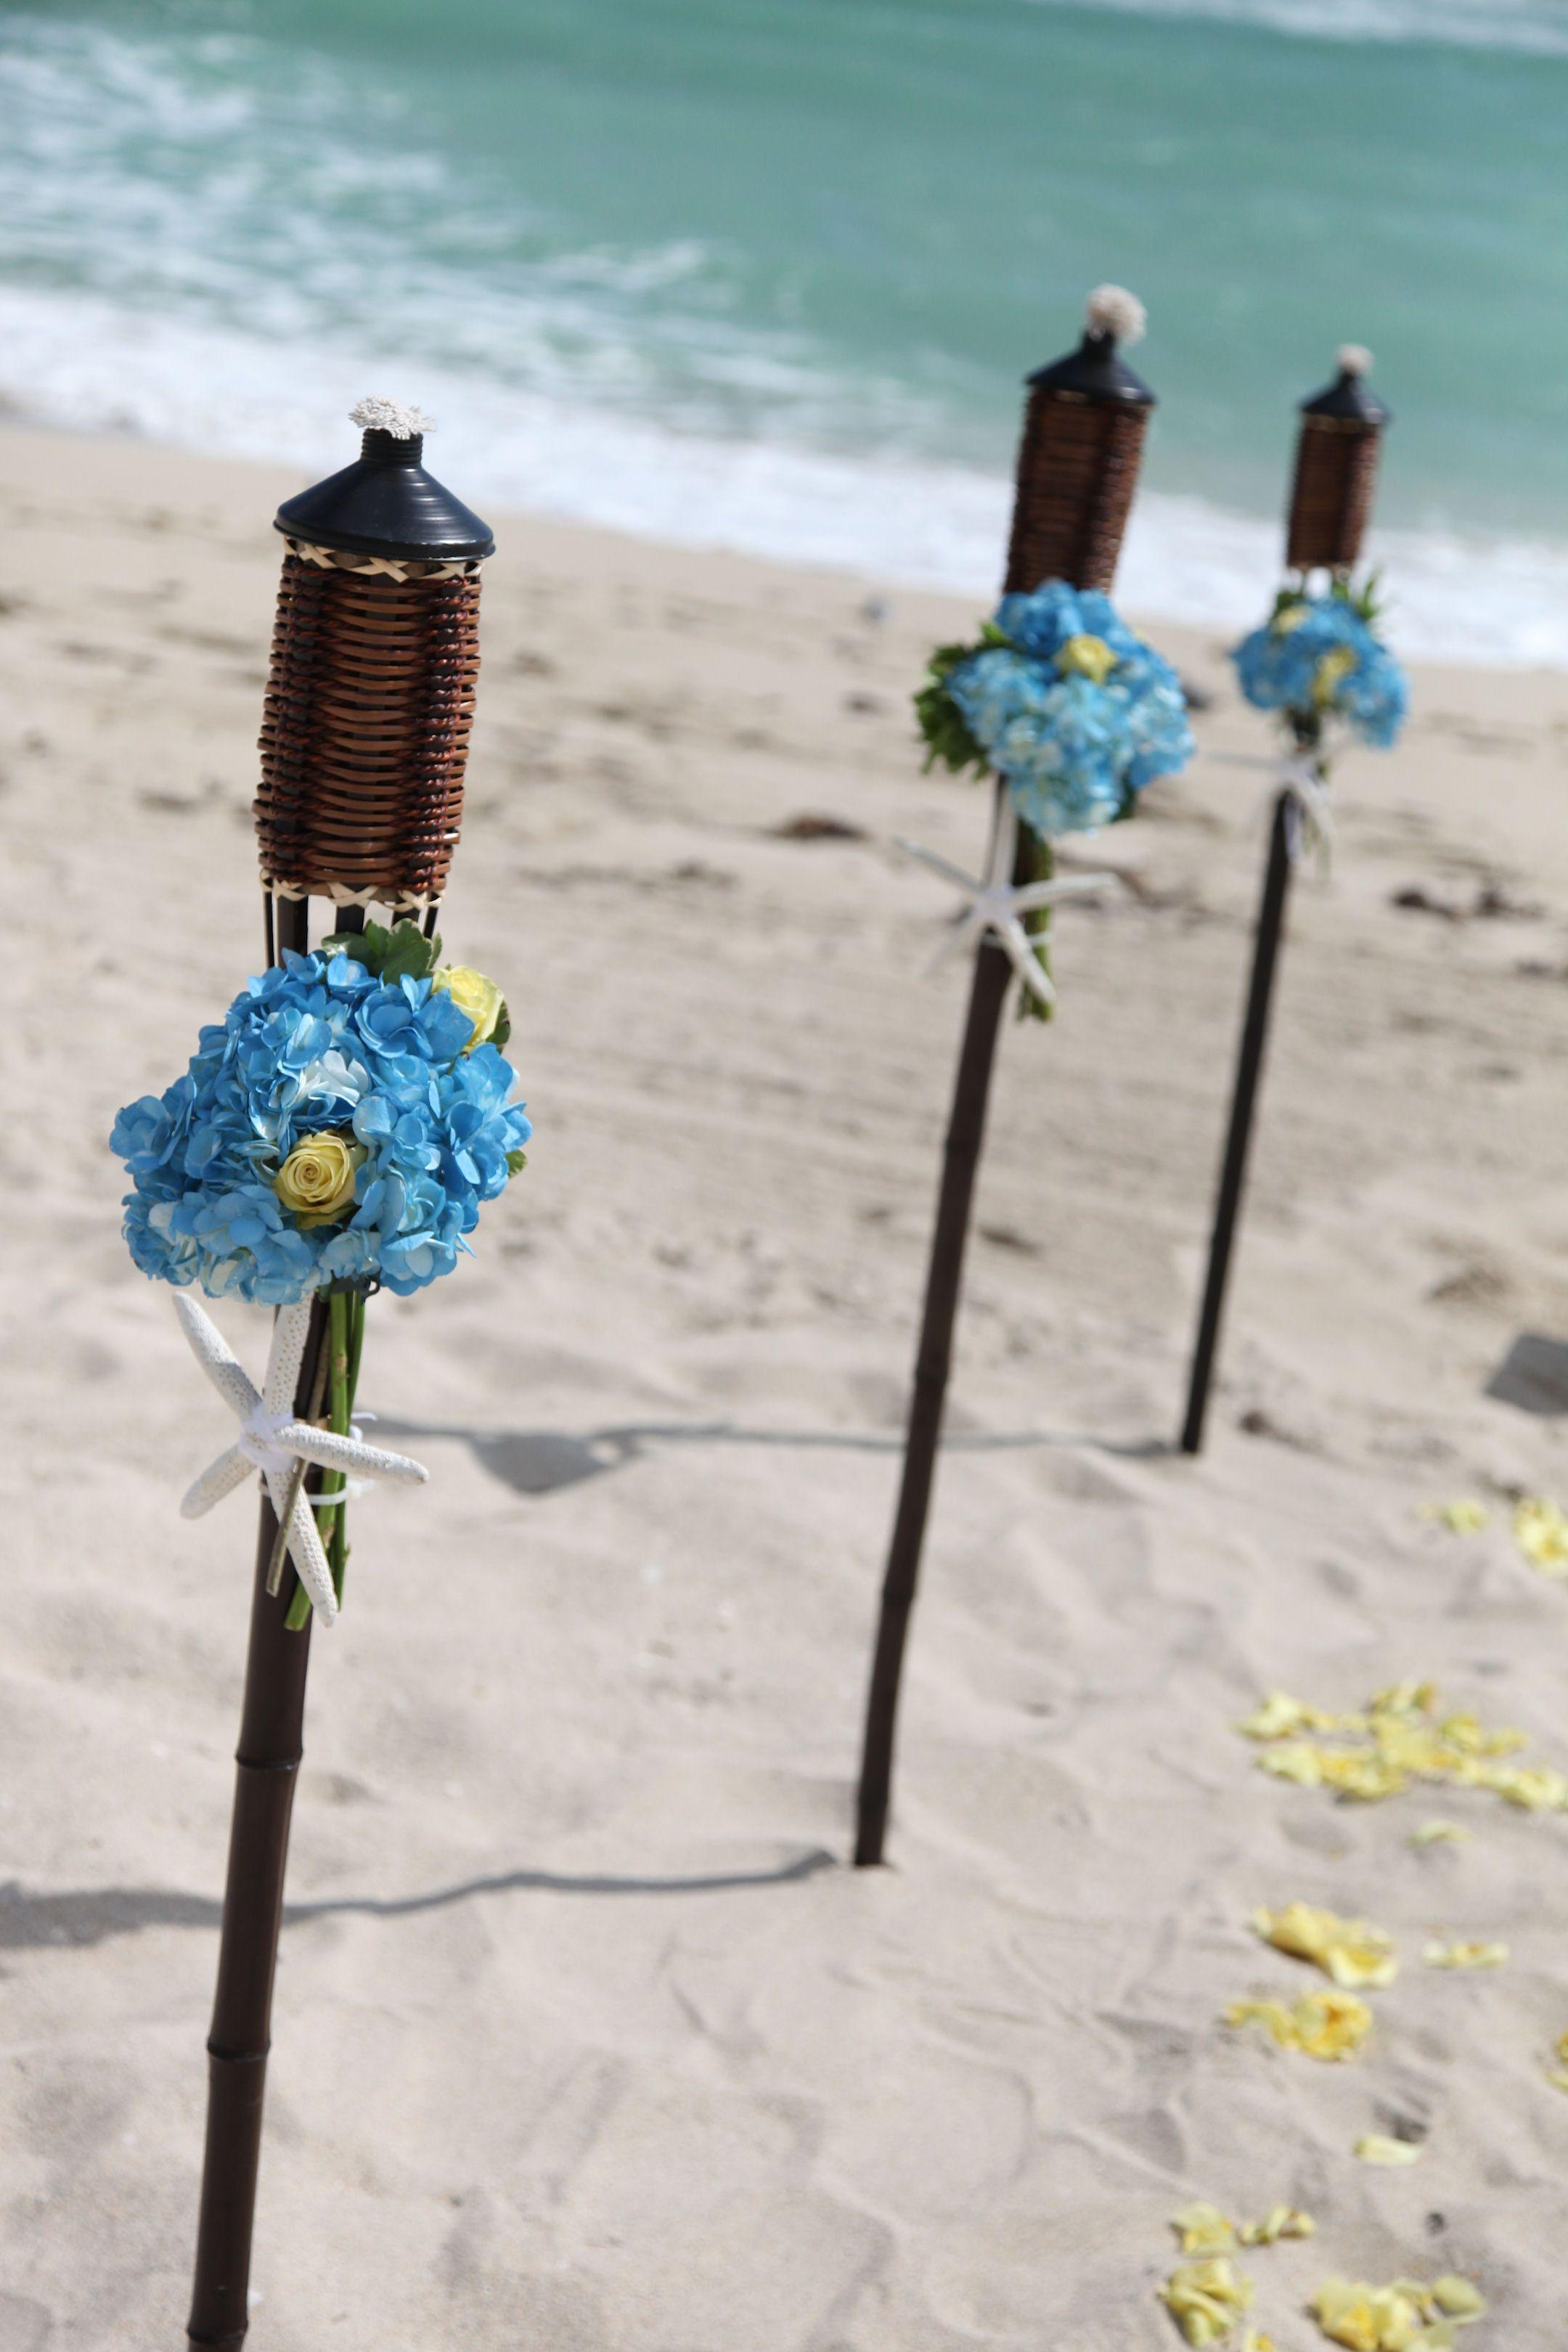 Simple Beach Wedding Bouquets   Real Wedding: Justin and Sara's Beach Wedding